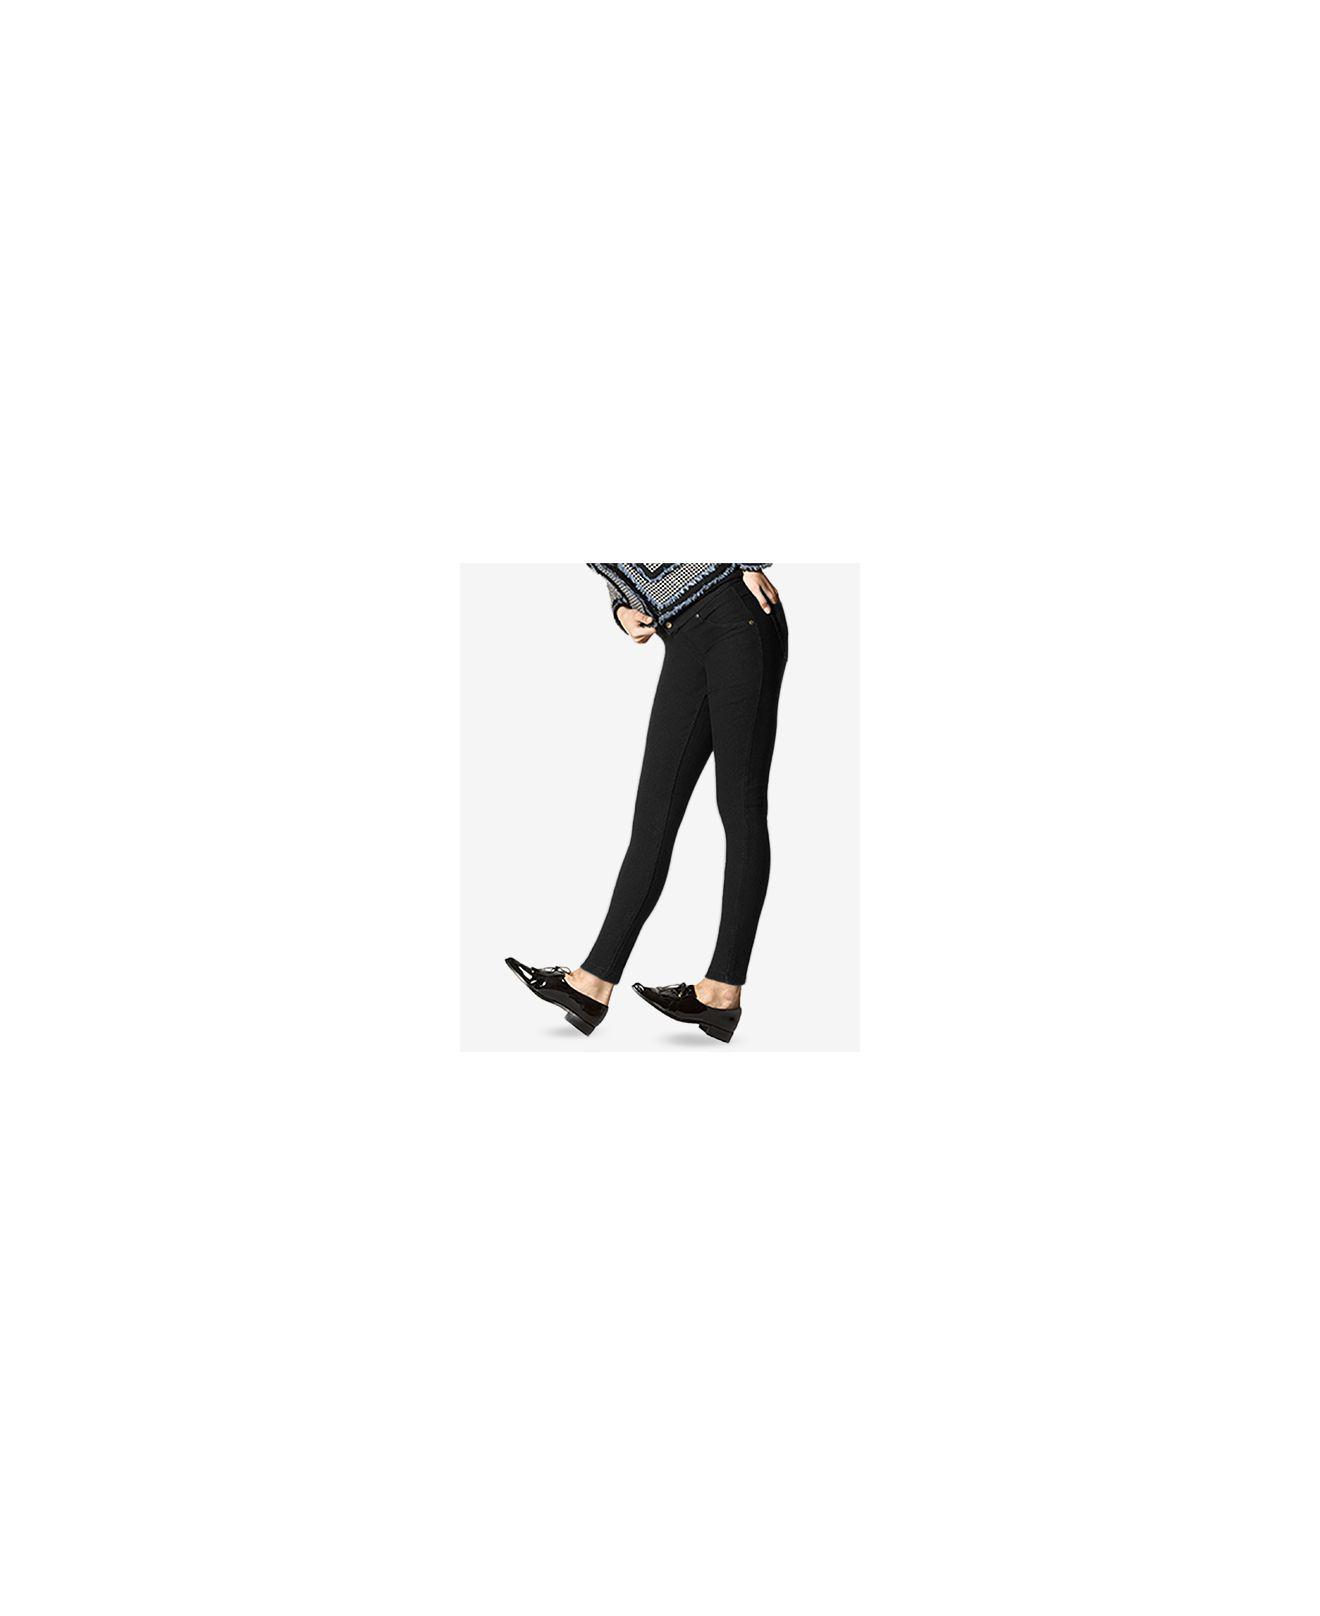 10f801c4a7cd7d Lyst - Hue ® Fleece-lined Denim Leggings in Black